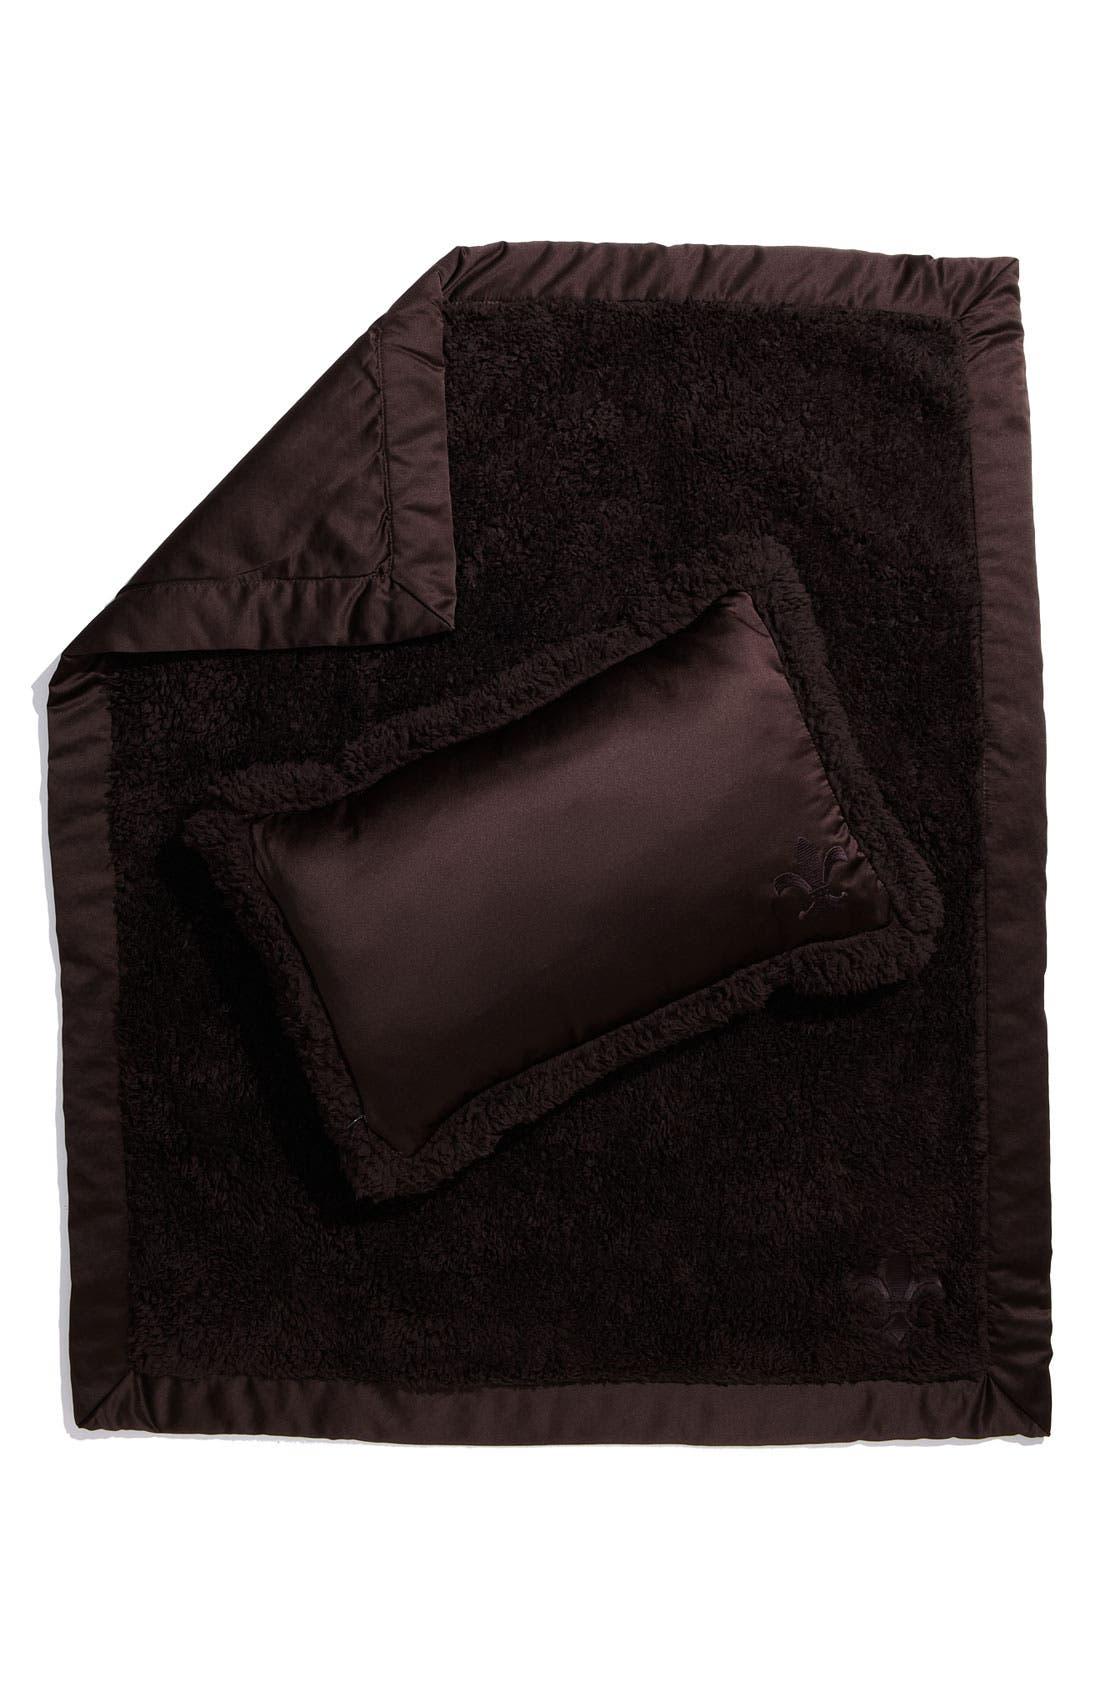 Main Image - Barefoot Dreams® 'Nap to Go' Blanket & Pillow Set